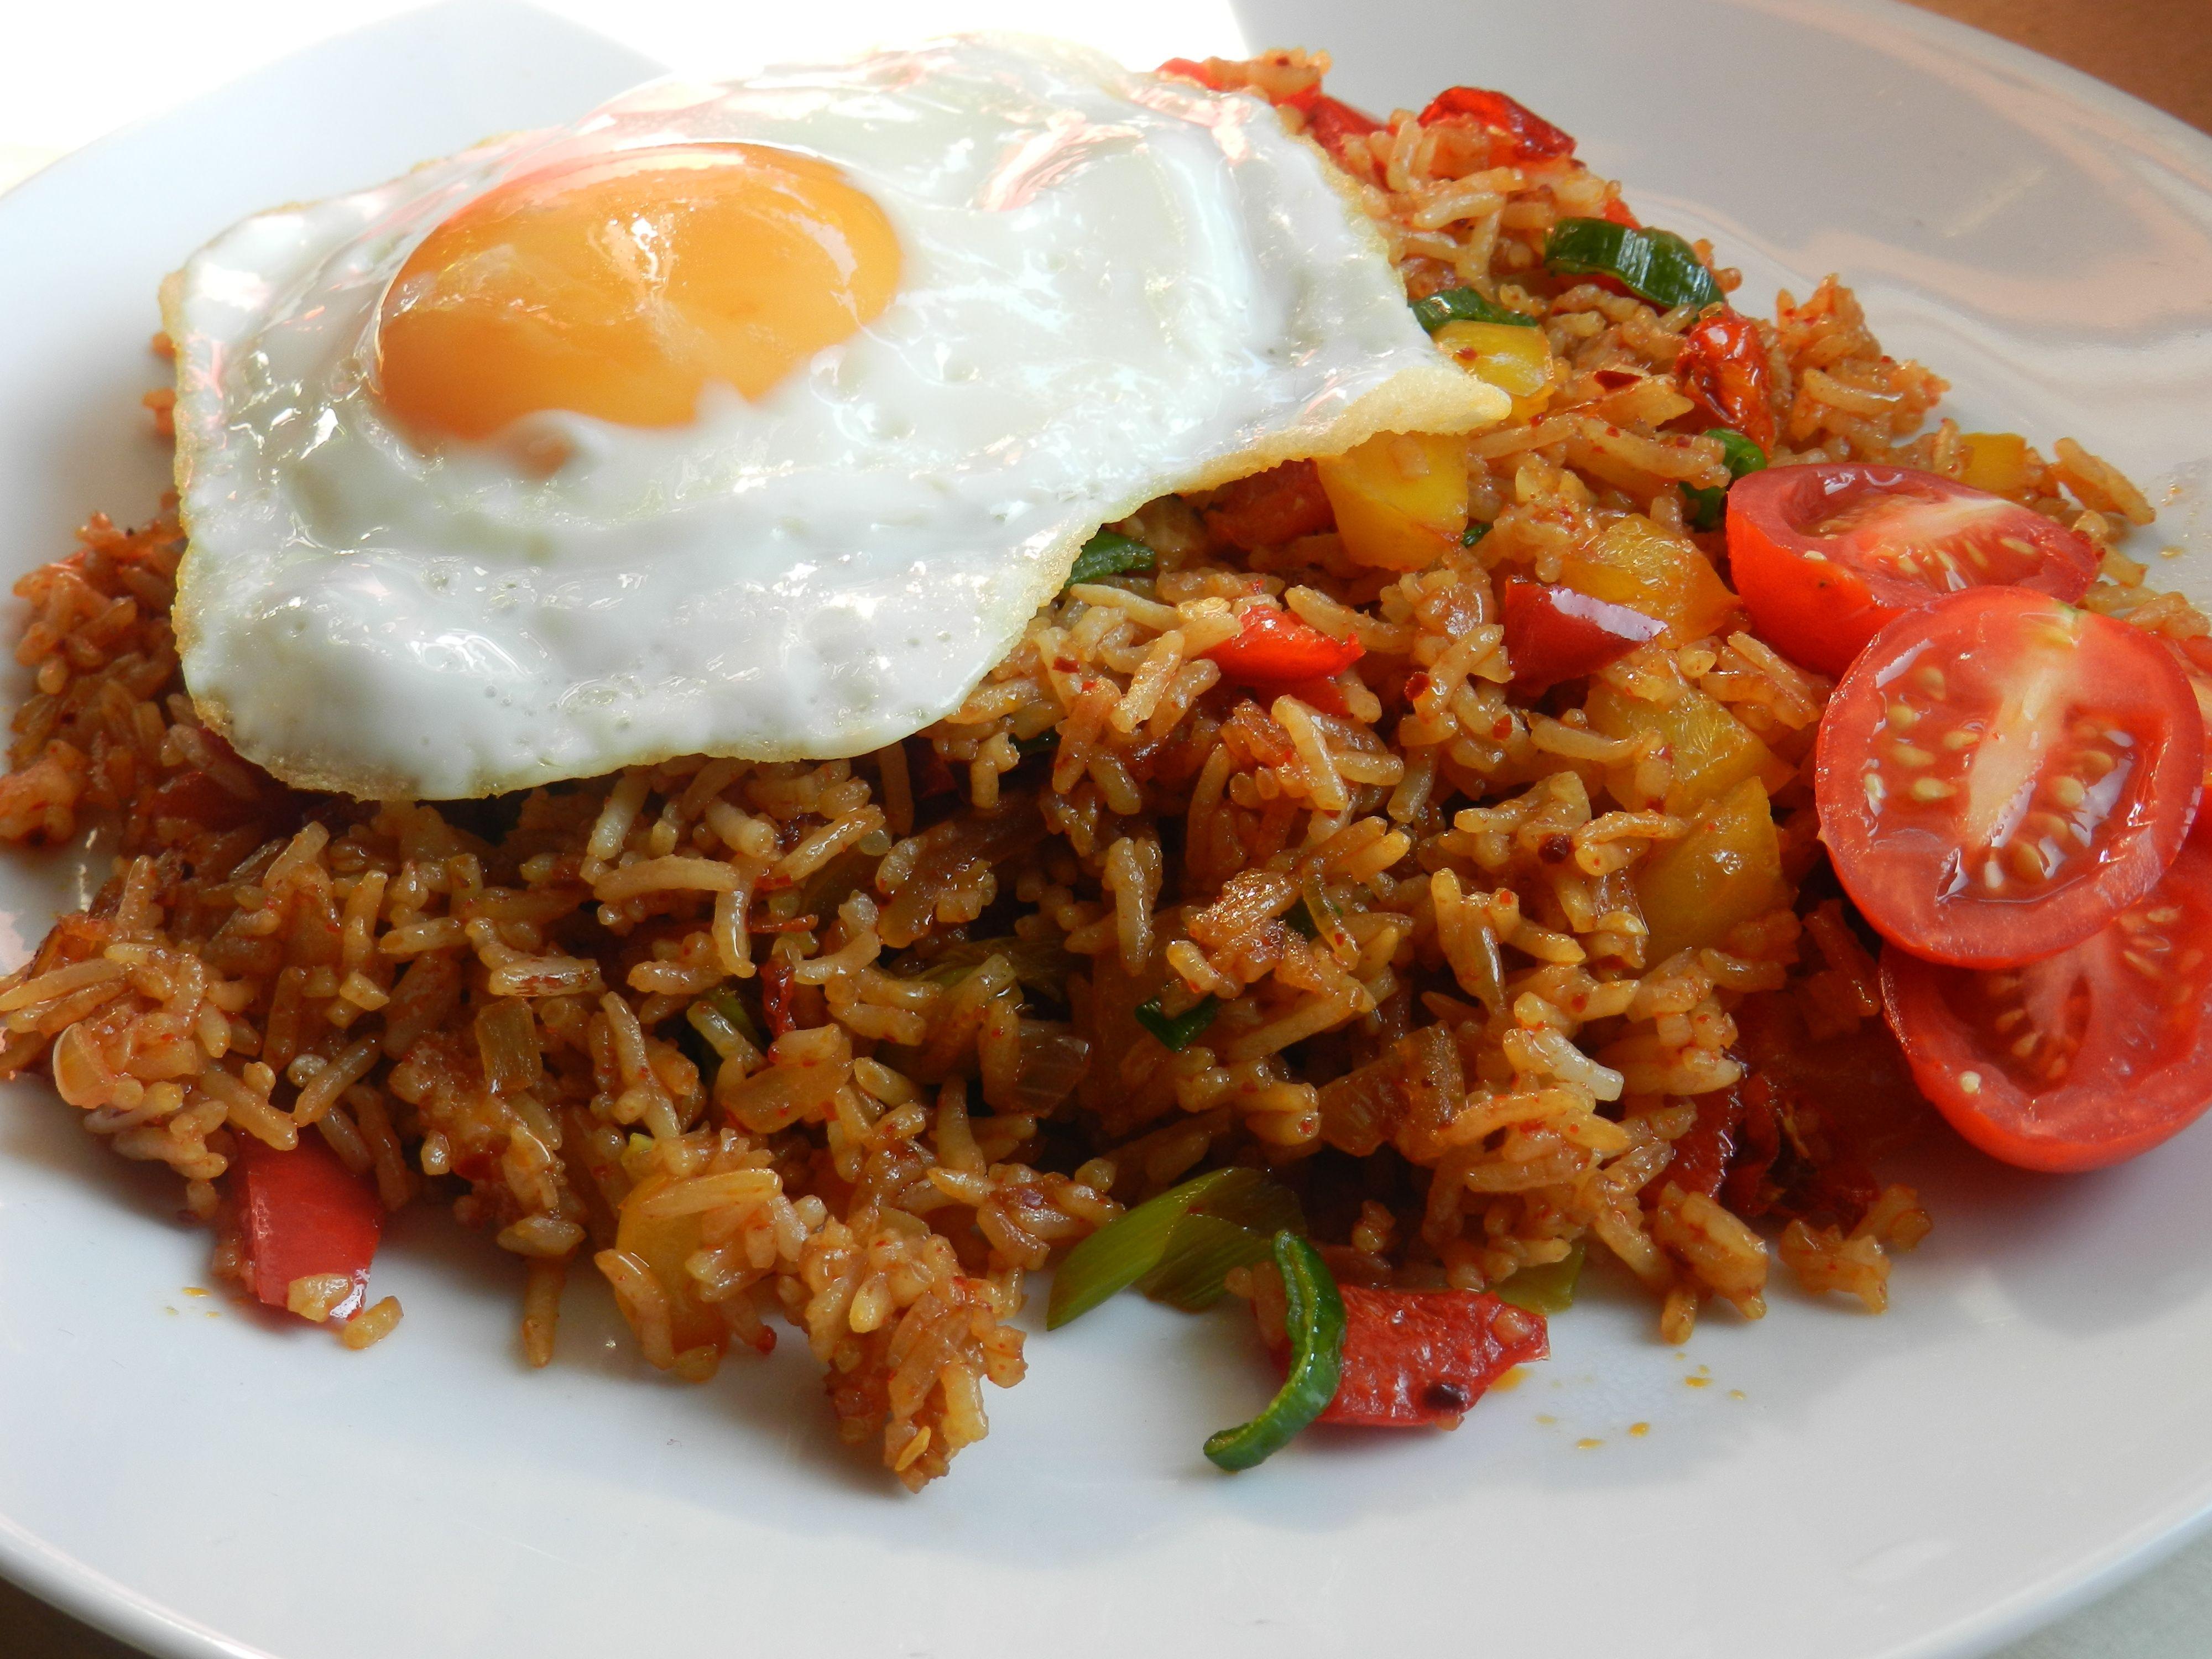 Nasi Goreng Kampung Nasi Goreng Malaysian Food Nasi Goreng Kampung